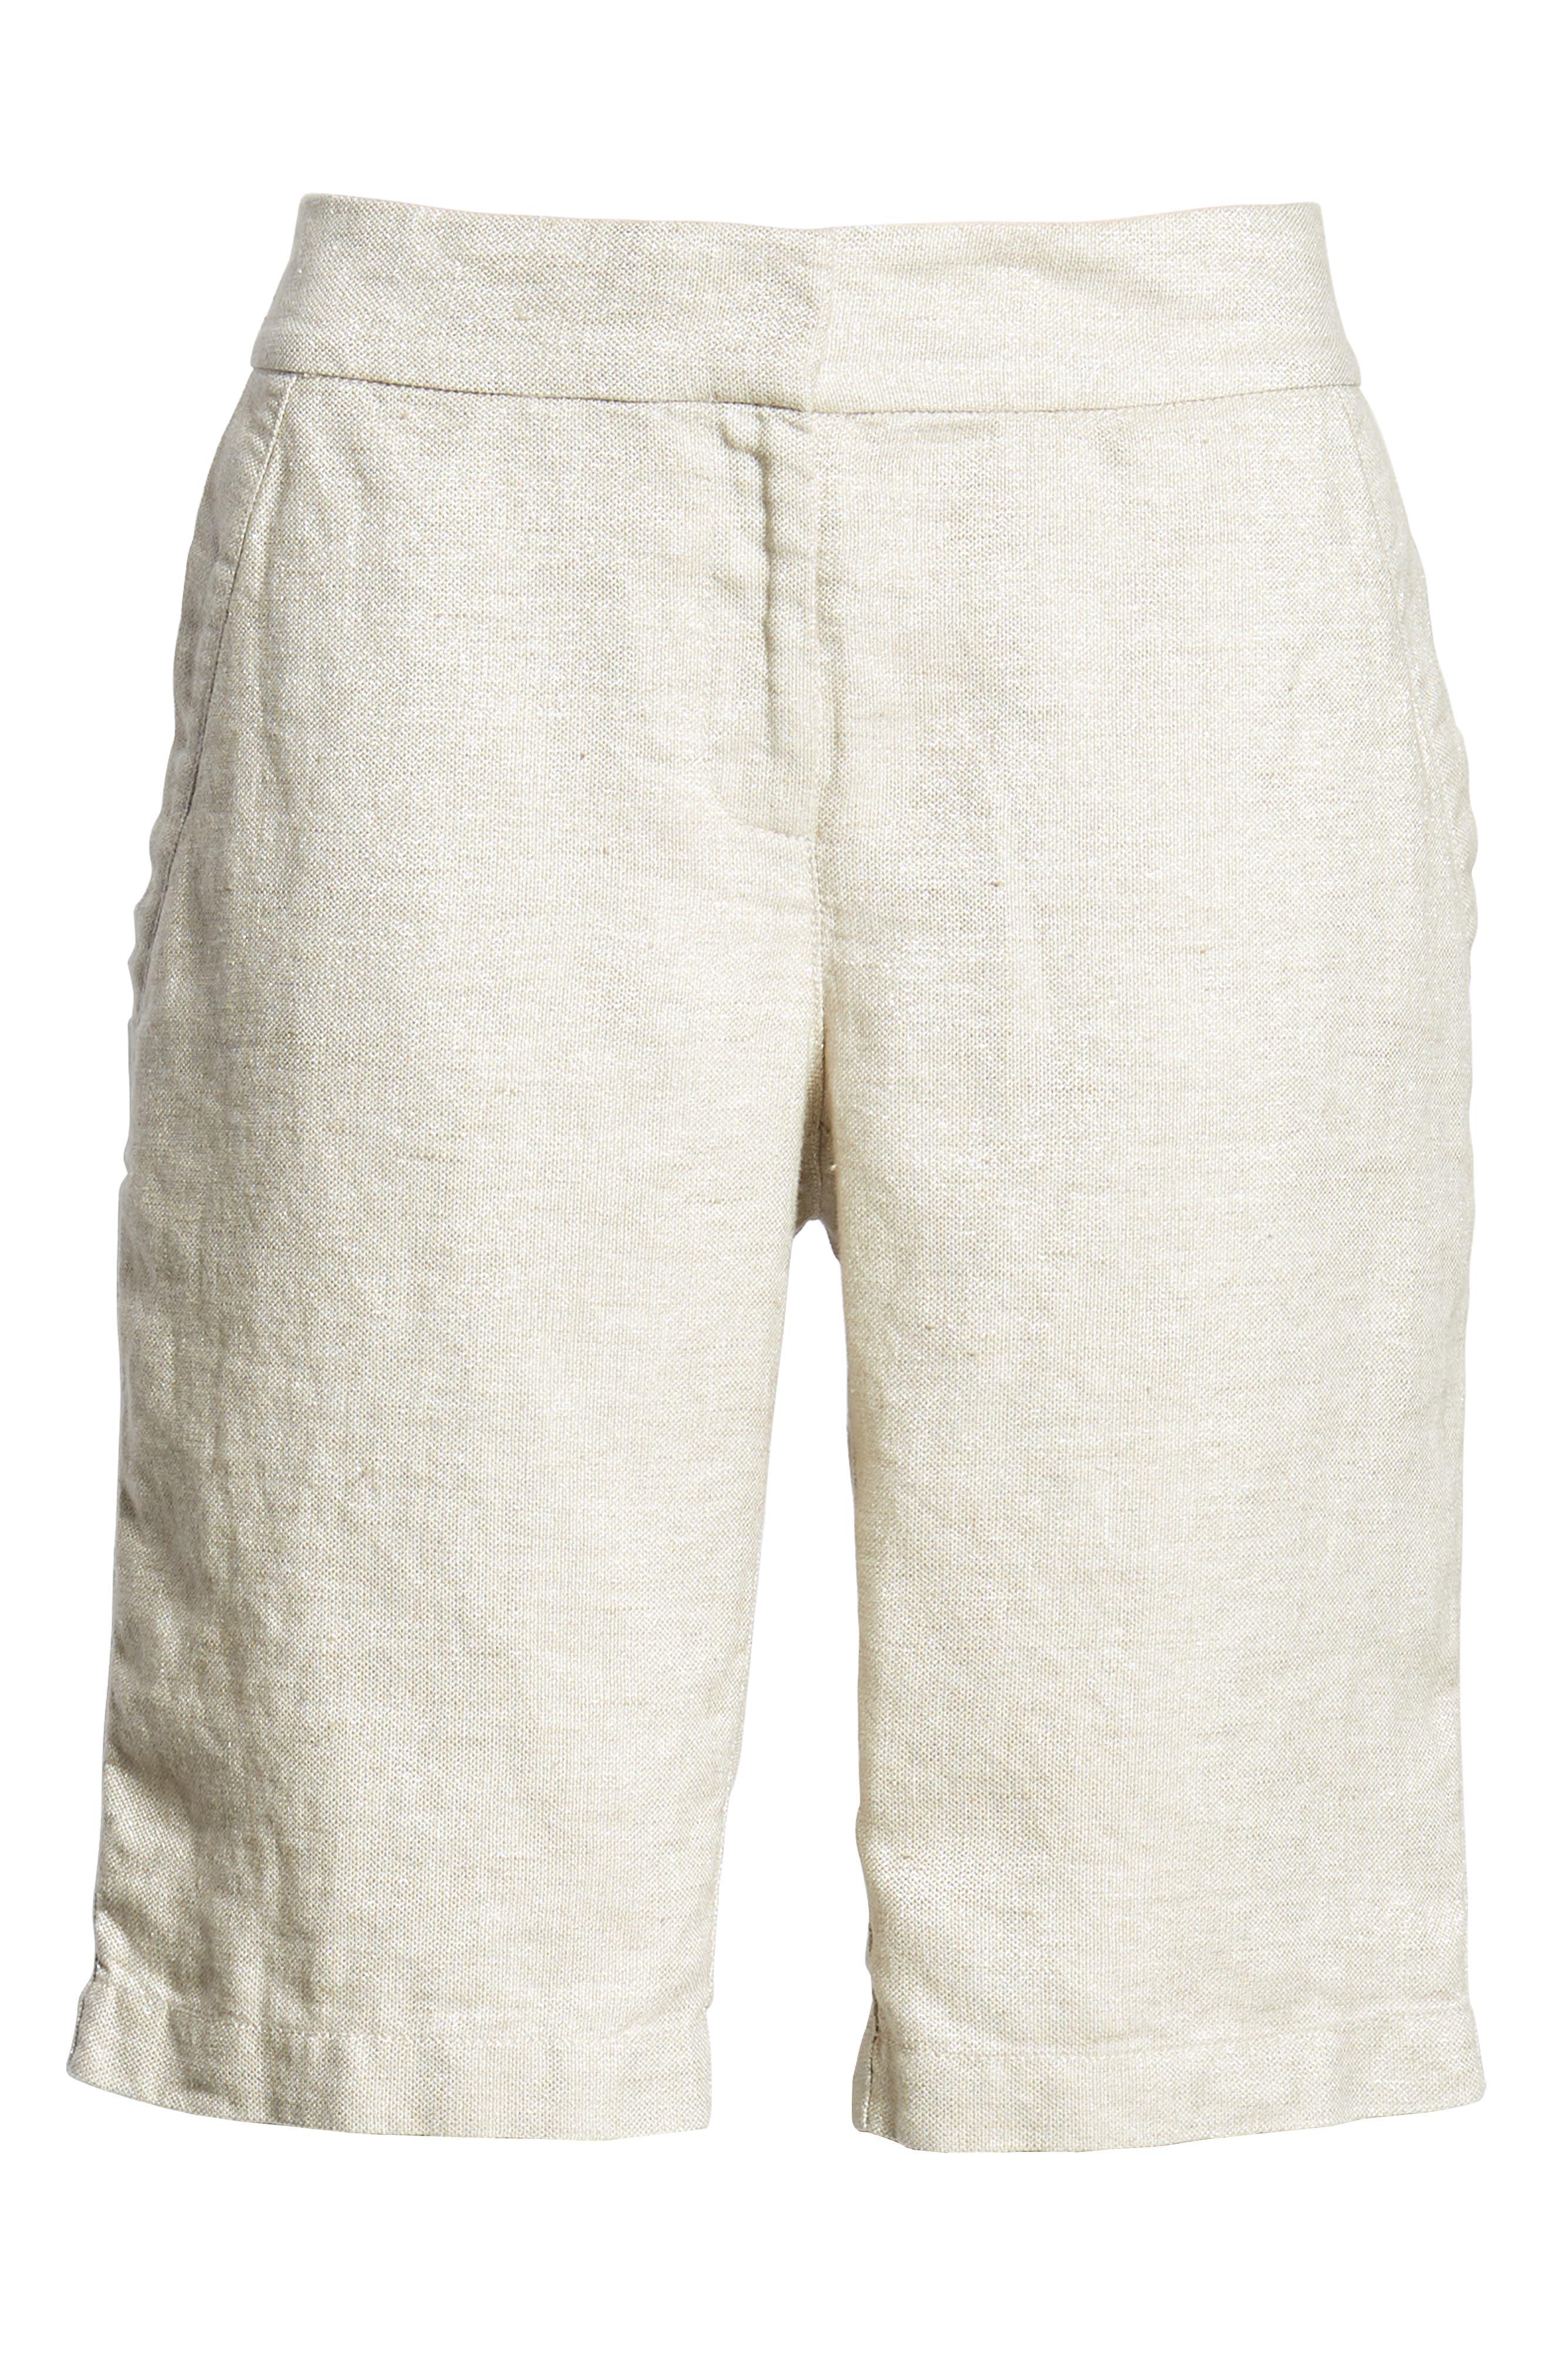 Organic Linen Blend Walking Shorts,                             Alternate thumbnail 6, color,